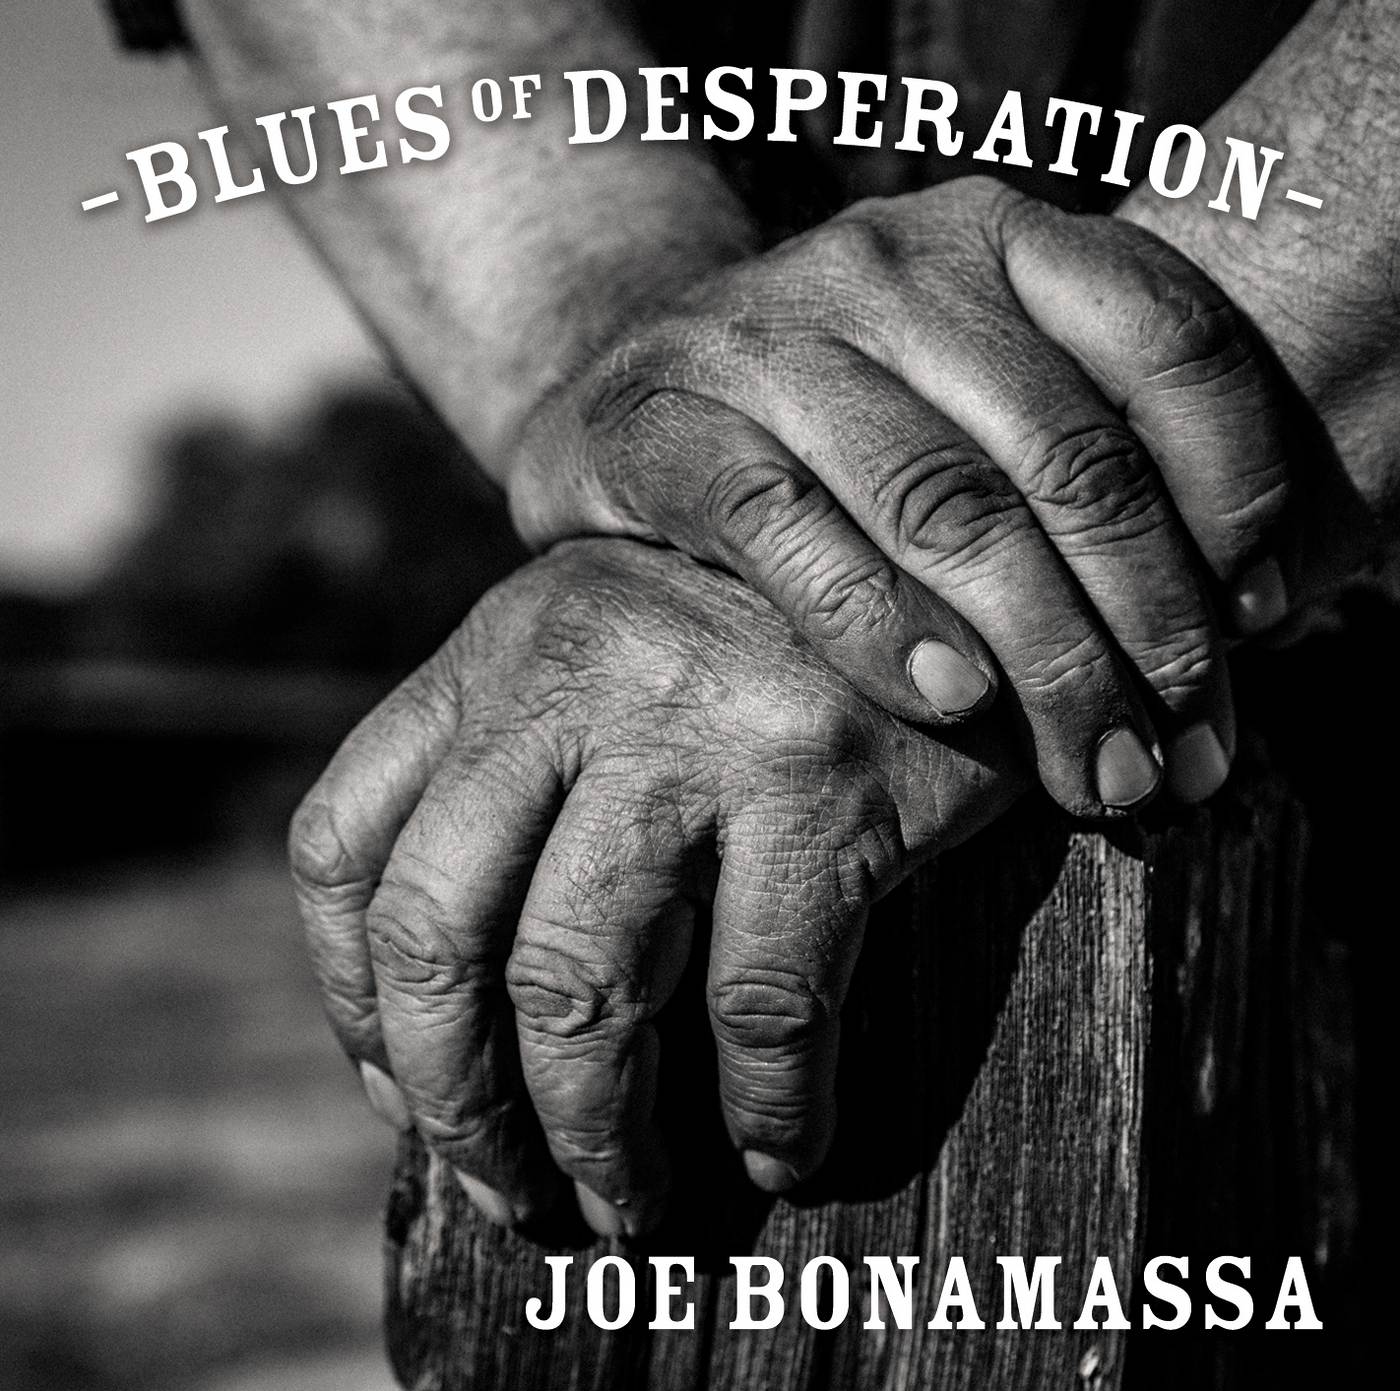 Joe Bonamassa: Blues Of Desperation (2016) Book Cover